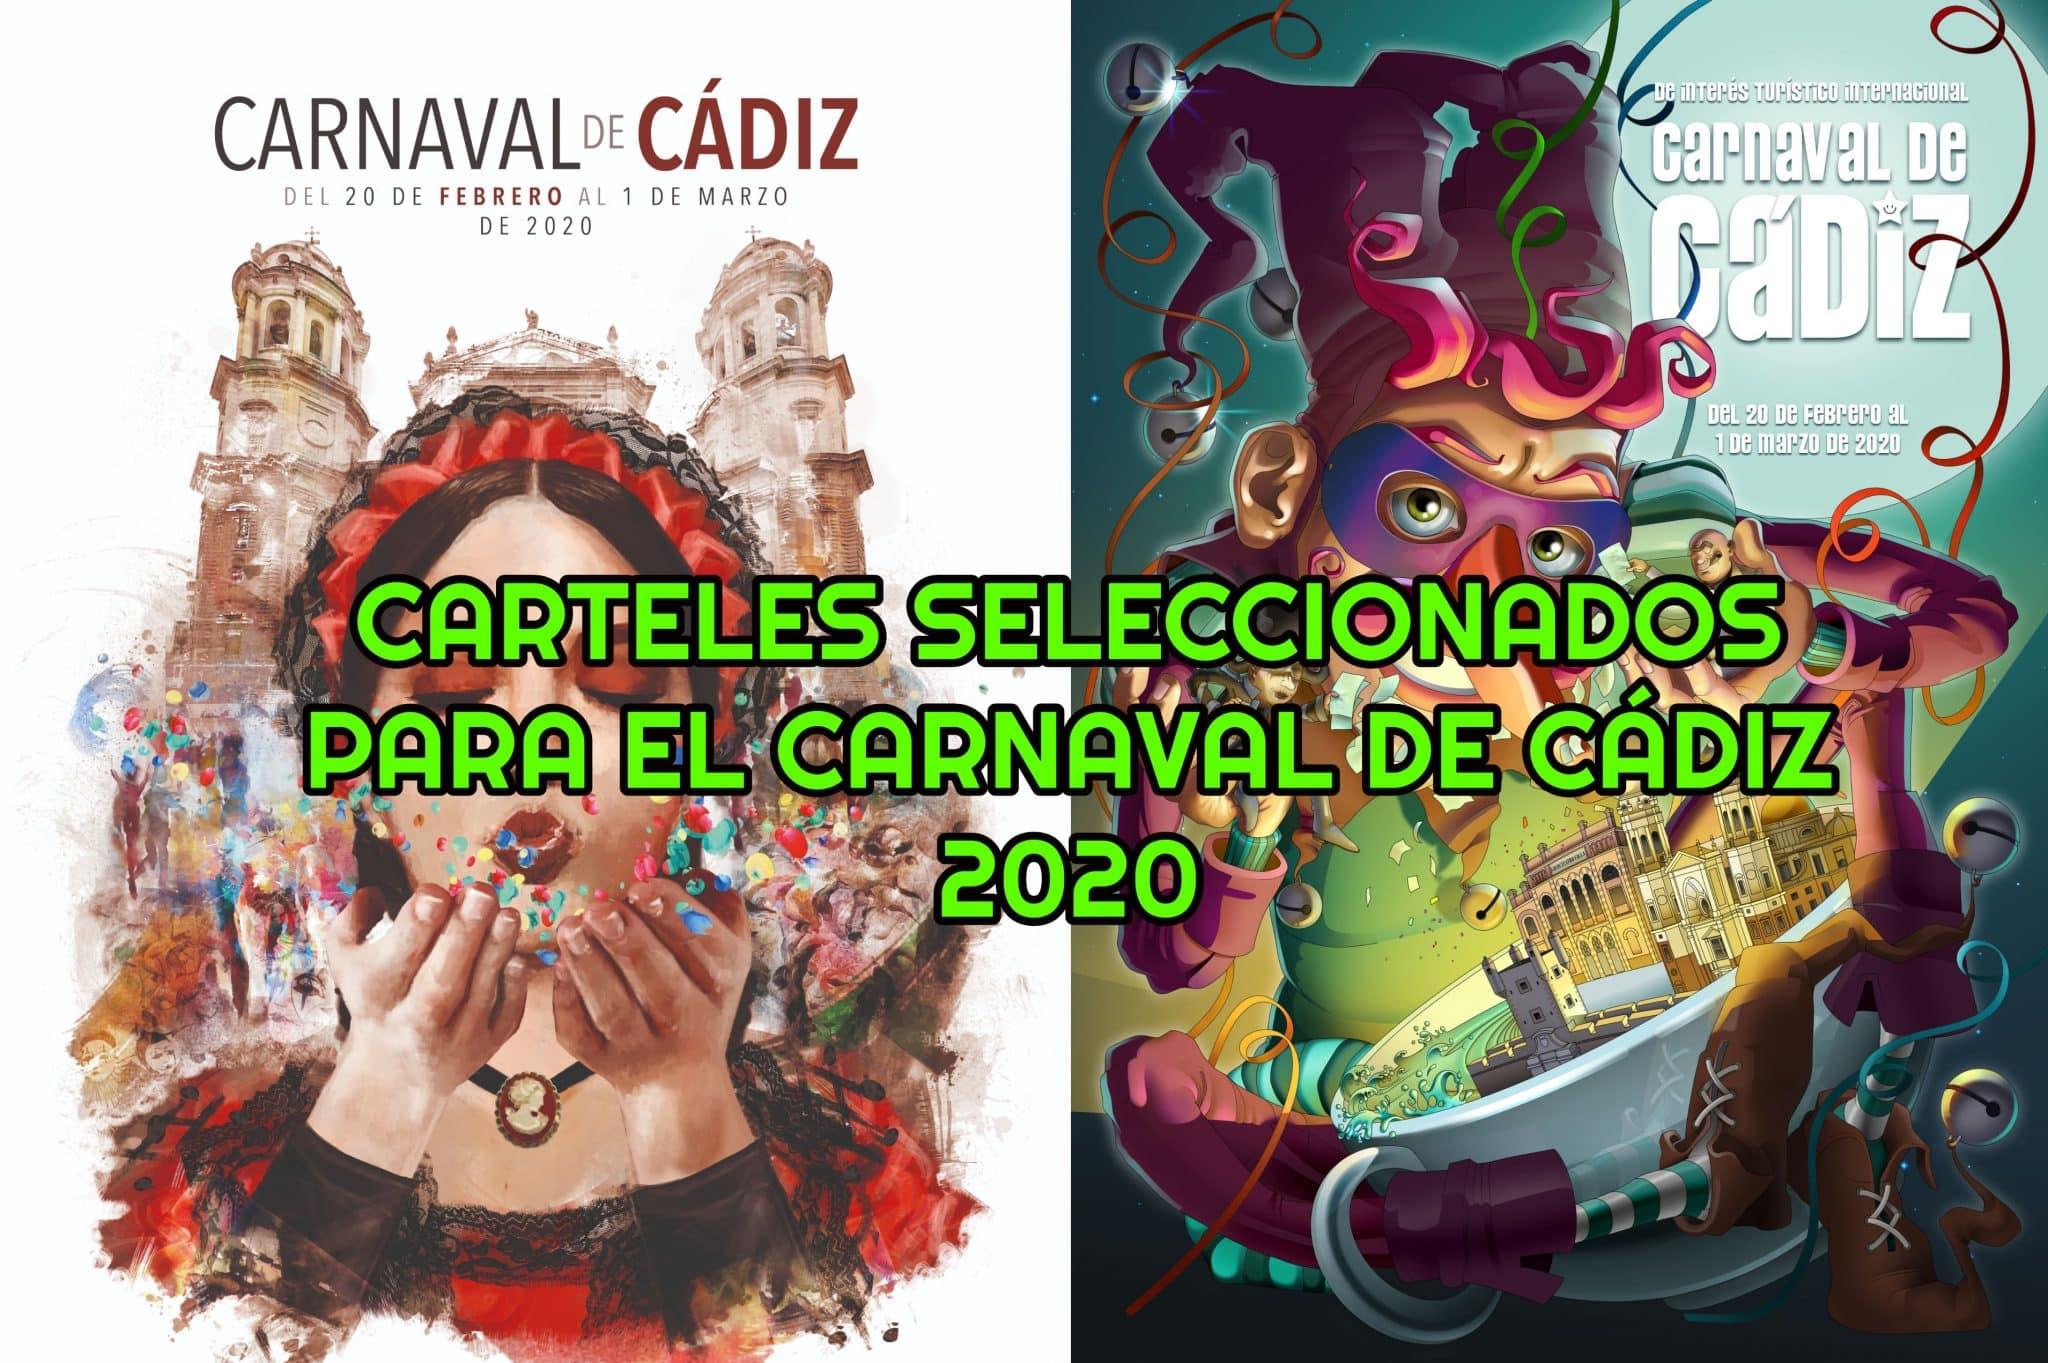 CARTEL CARNAVAL DE CADIZ 2020